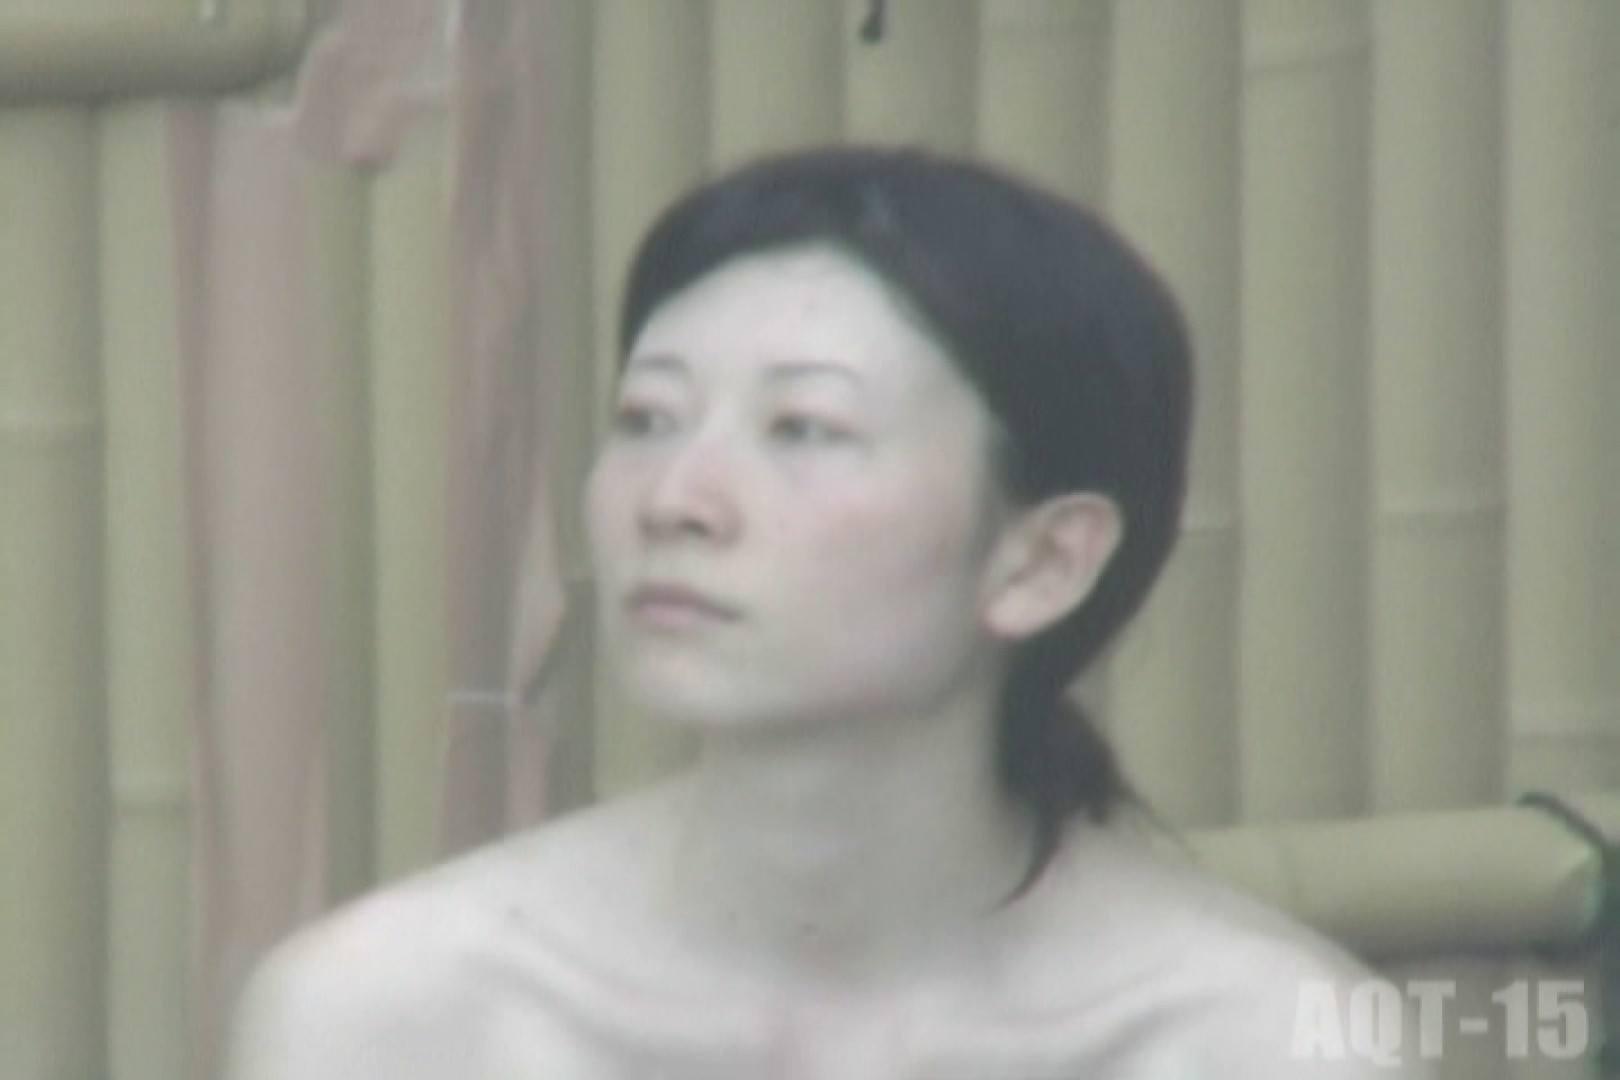 Aquaな露天風呂Vol.835 盗撮 | HなOL  73pic 24